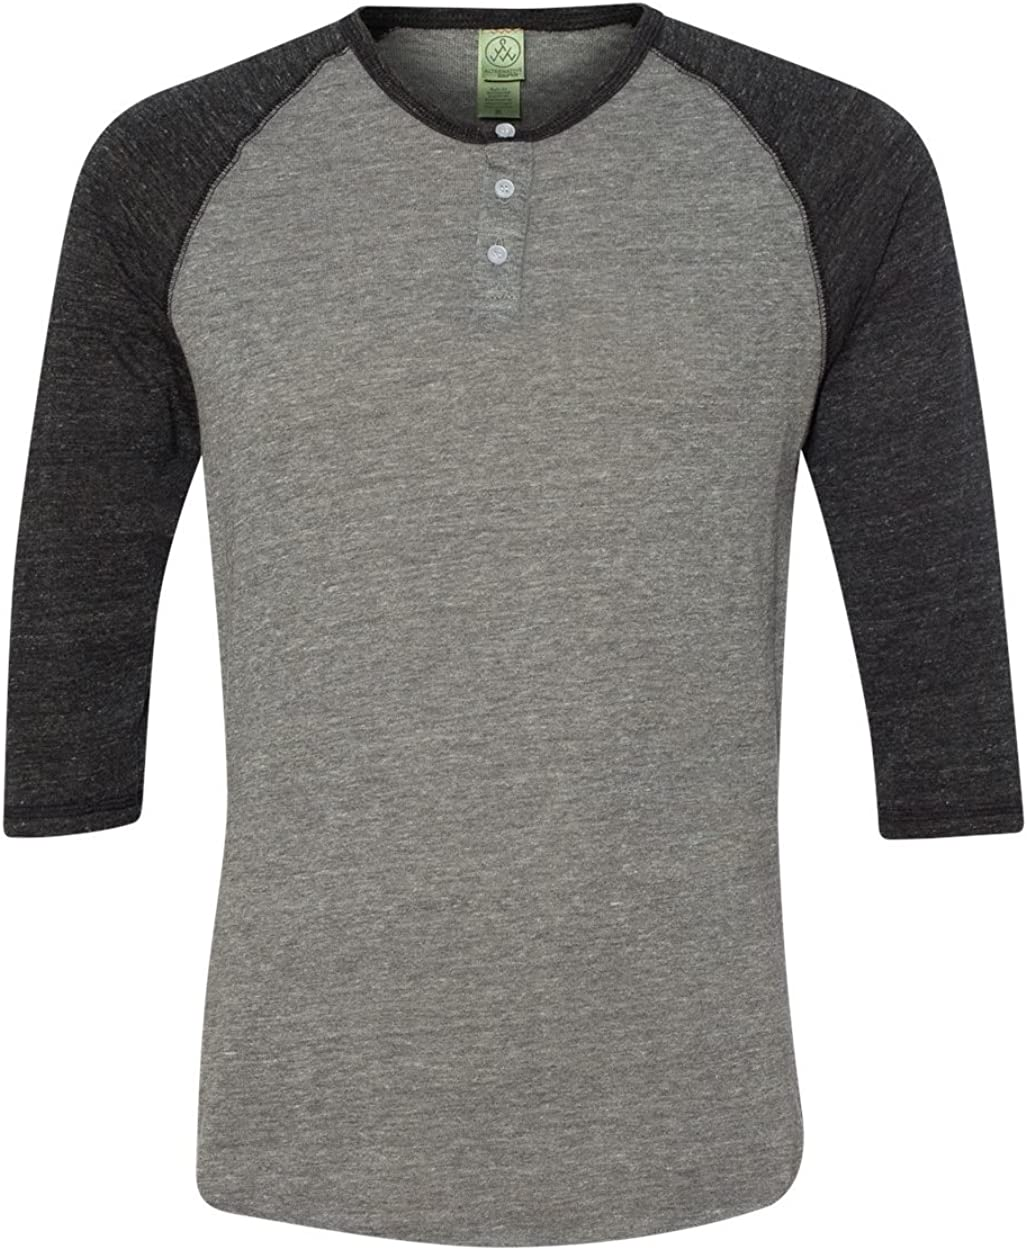 Alternative Men's Raglan Three-Quarter Henley Ranking TOP13 Rapid rise Sleeve Shirt